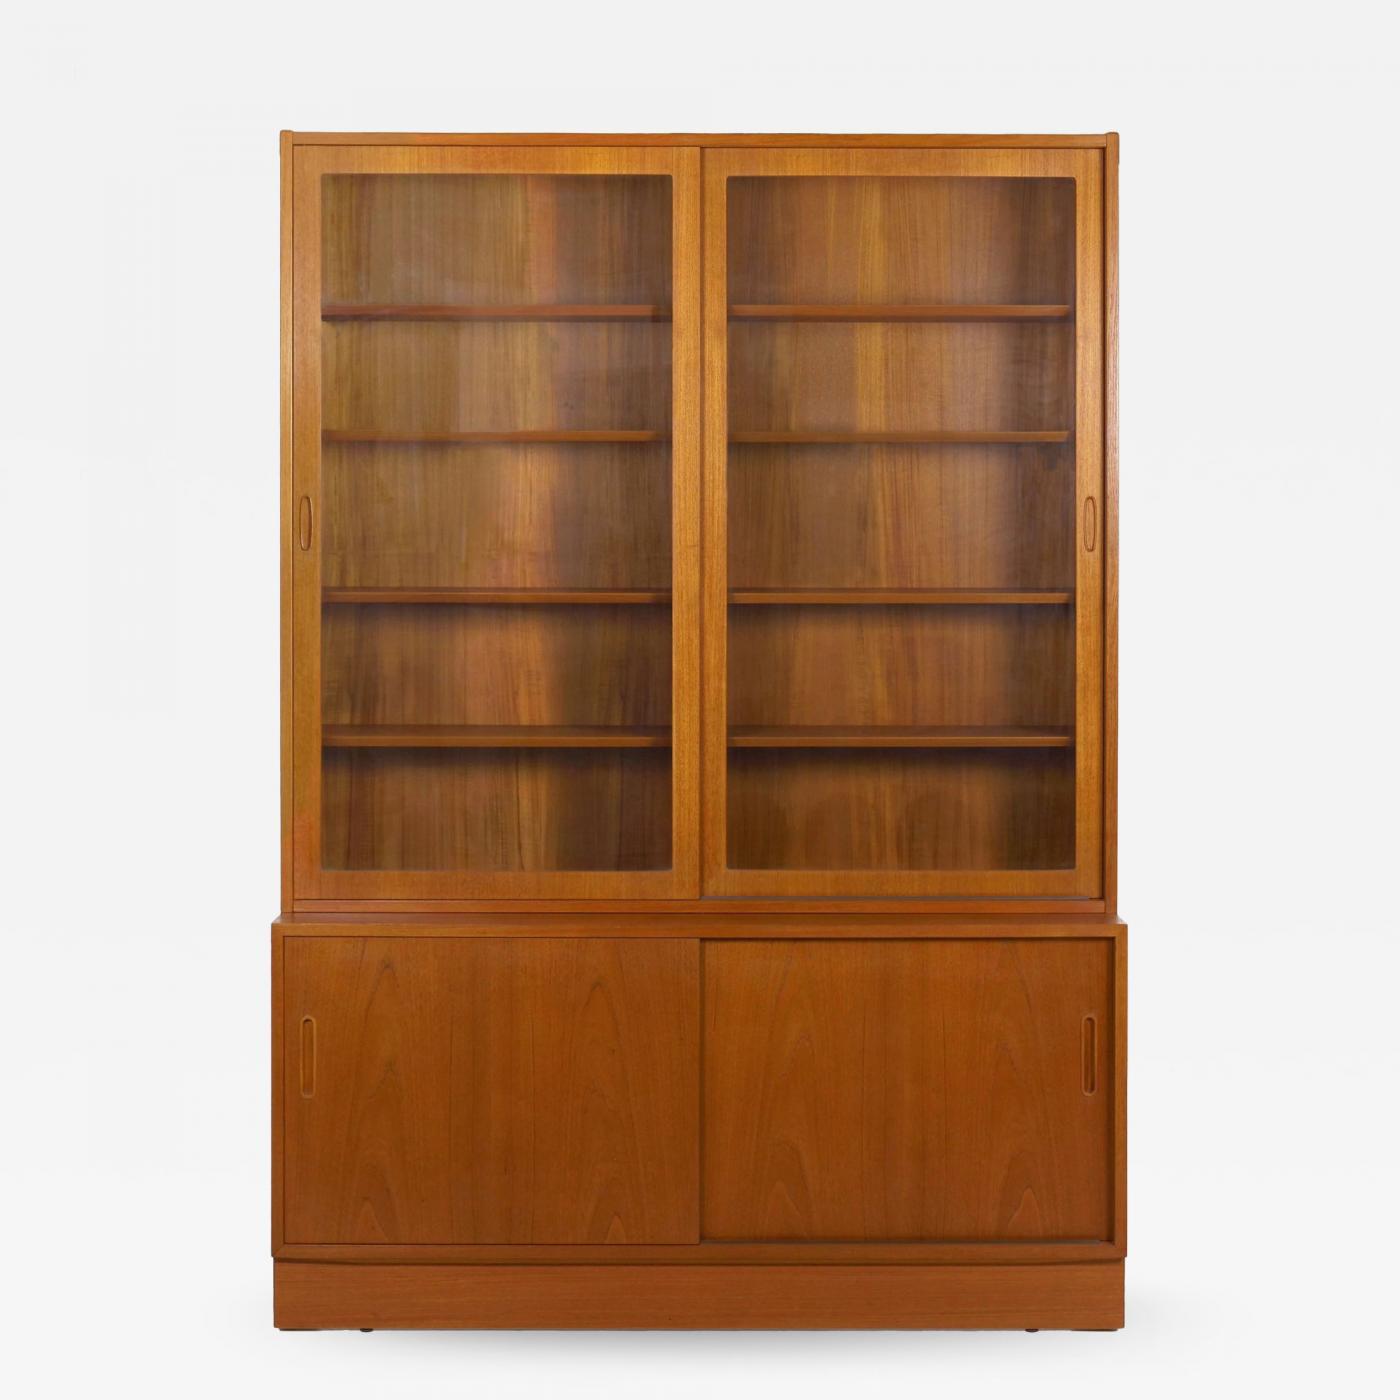 Poul Hundevad Danish Mid Century Modern Teak Bookcase Bookshelf Cabinet By Poul Hundevad